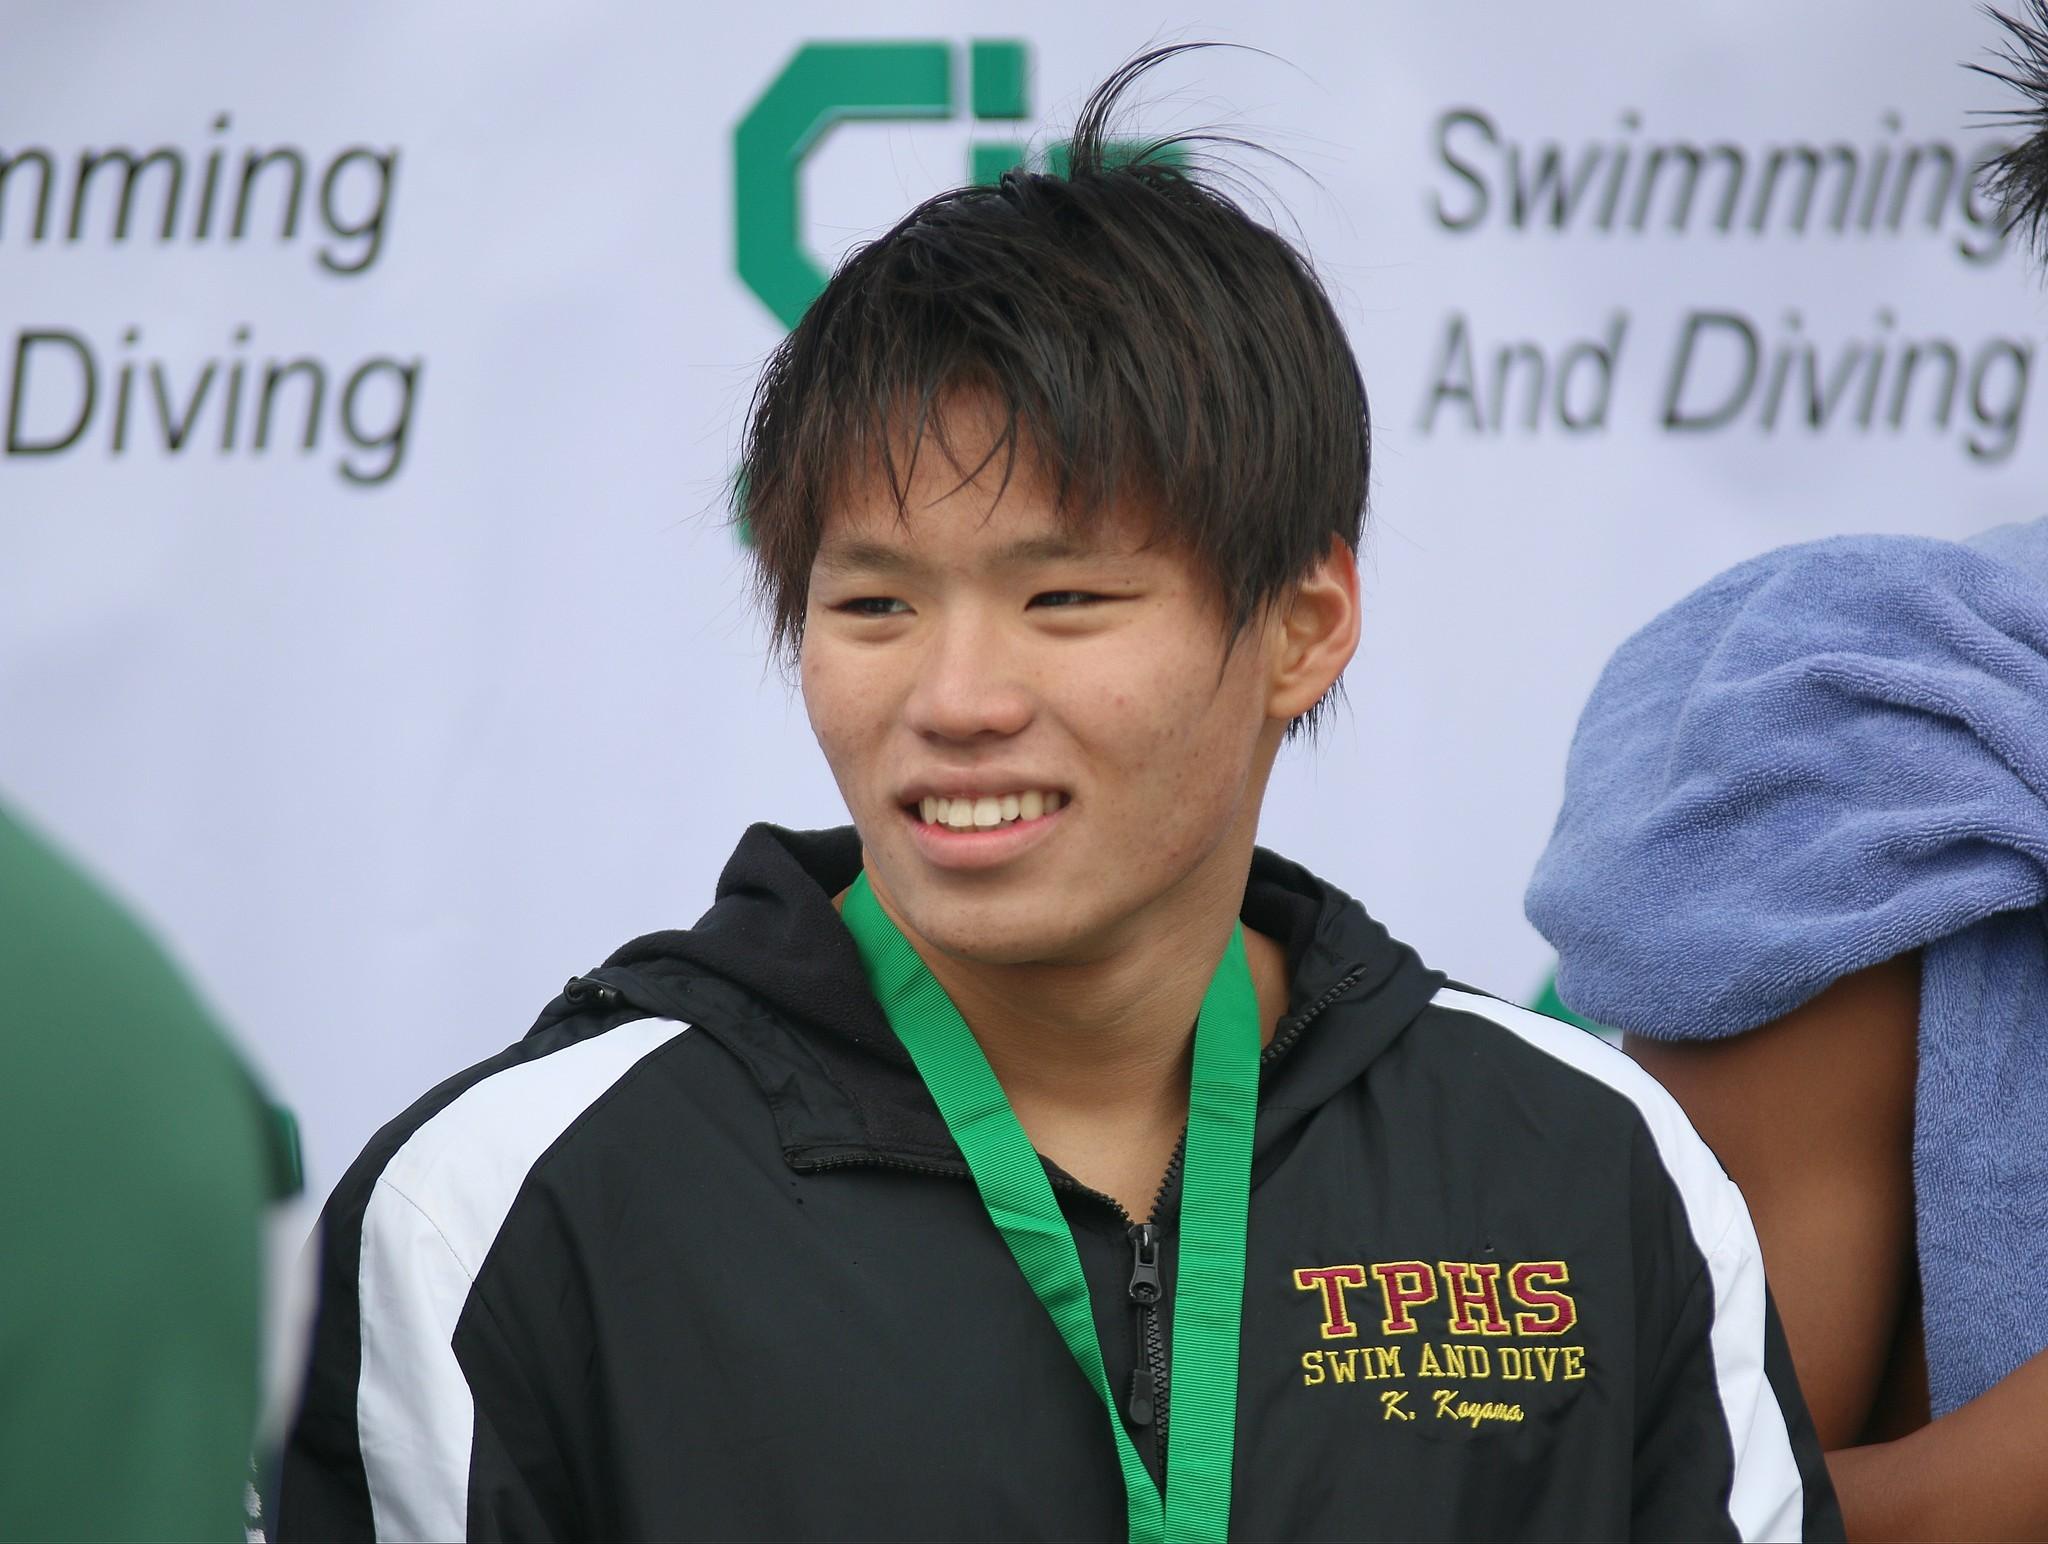 Swimming Koyama